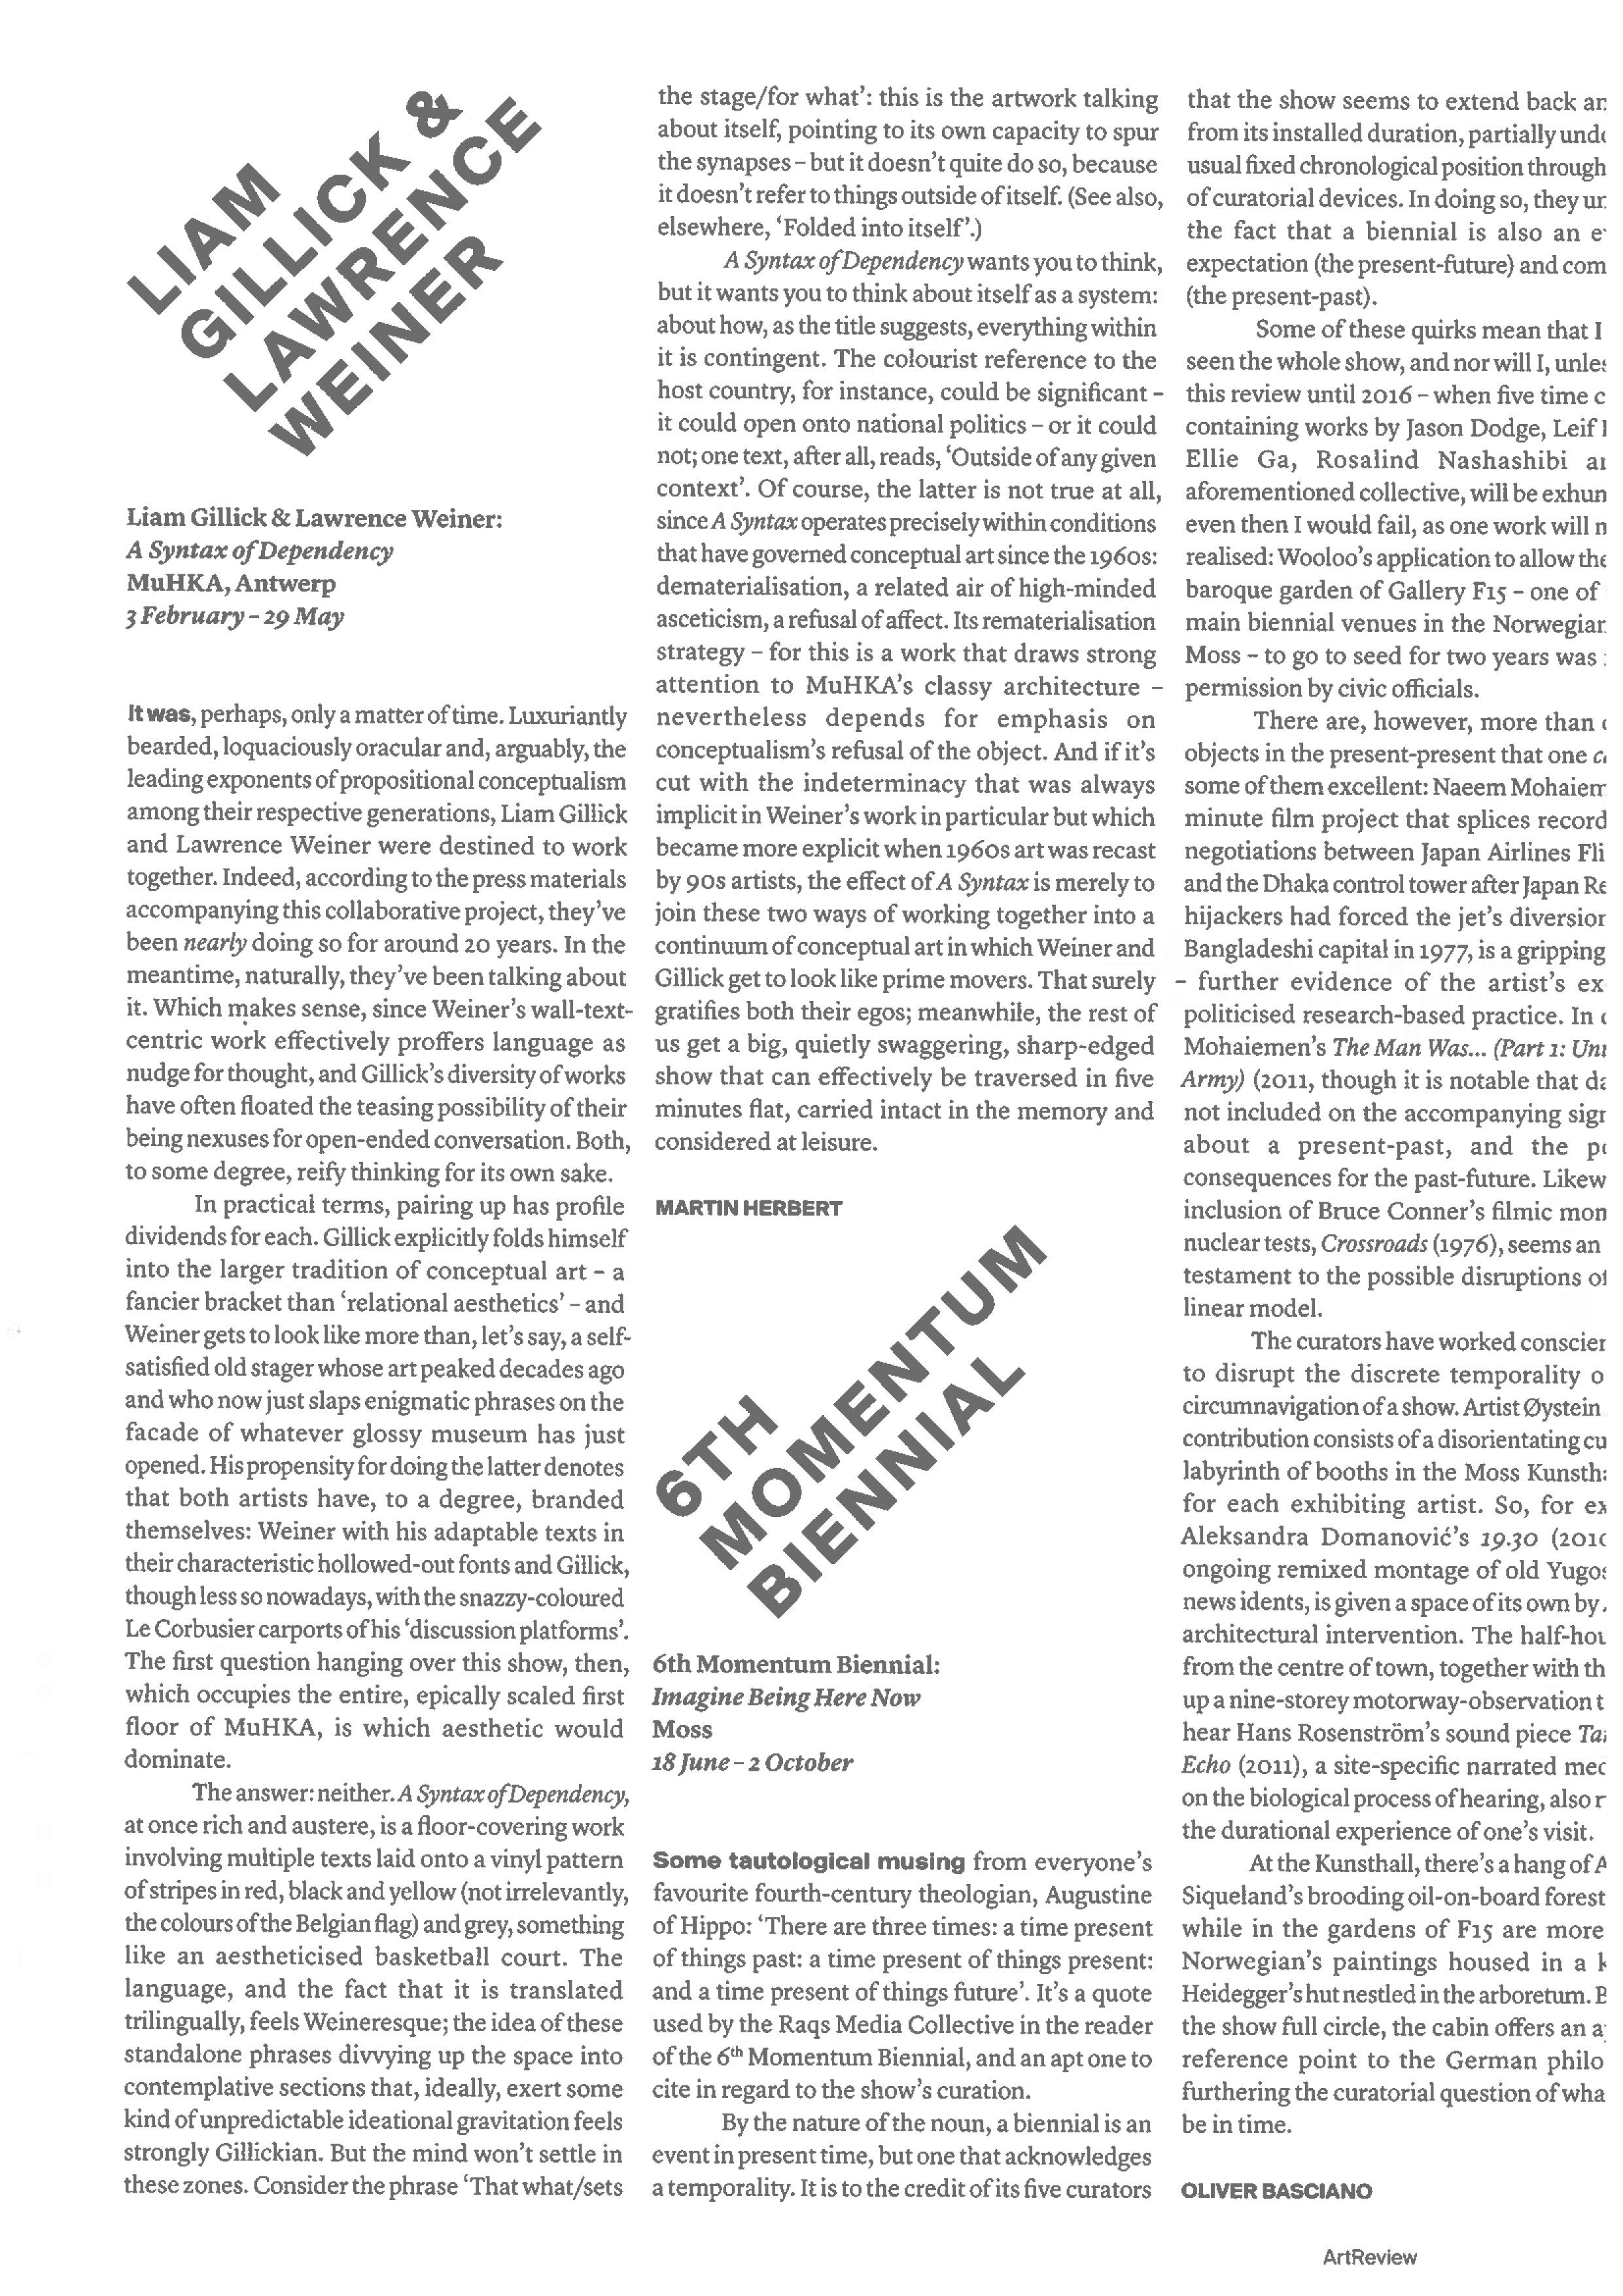 Art+Review11